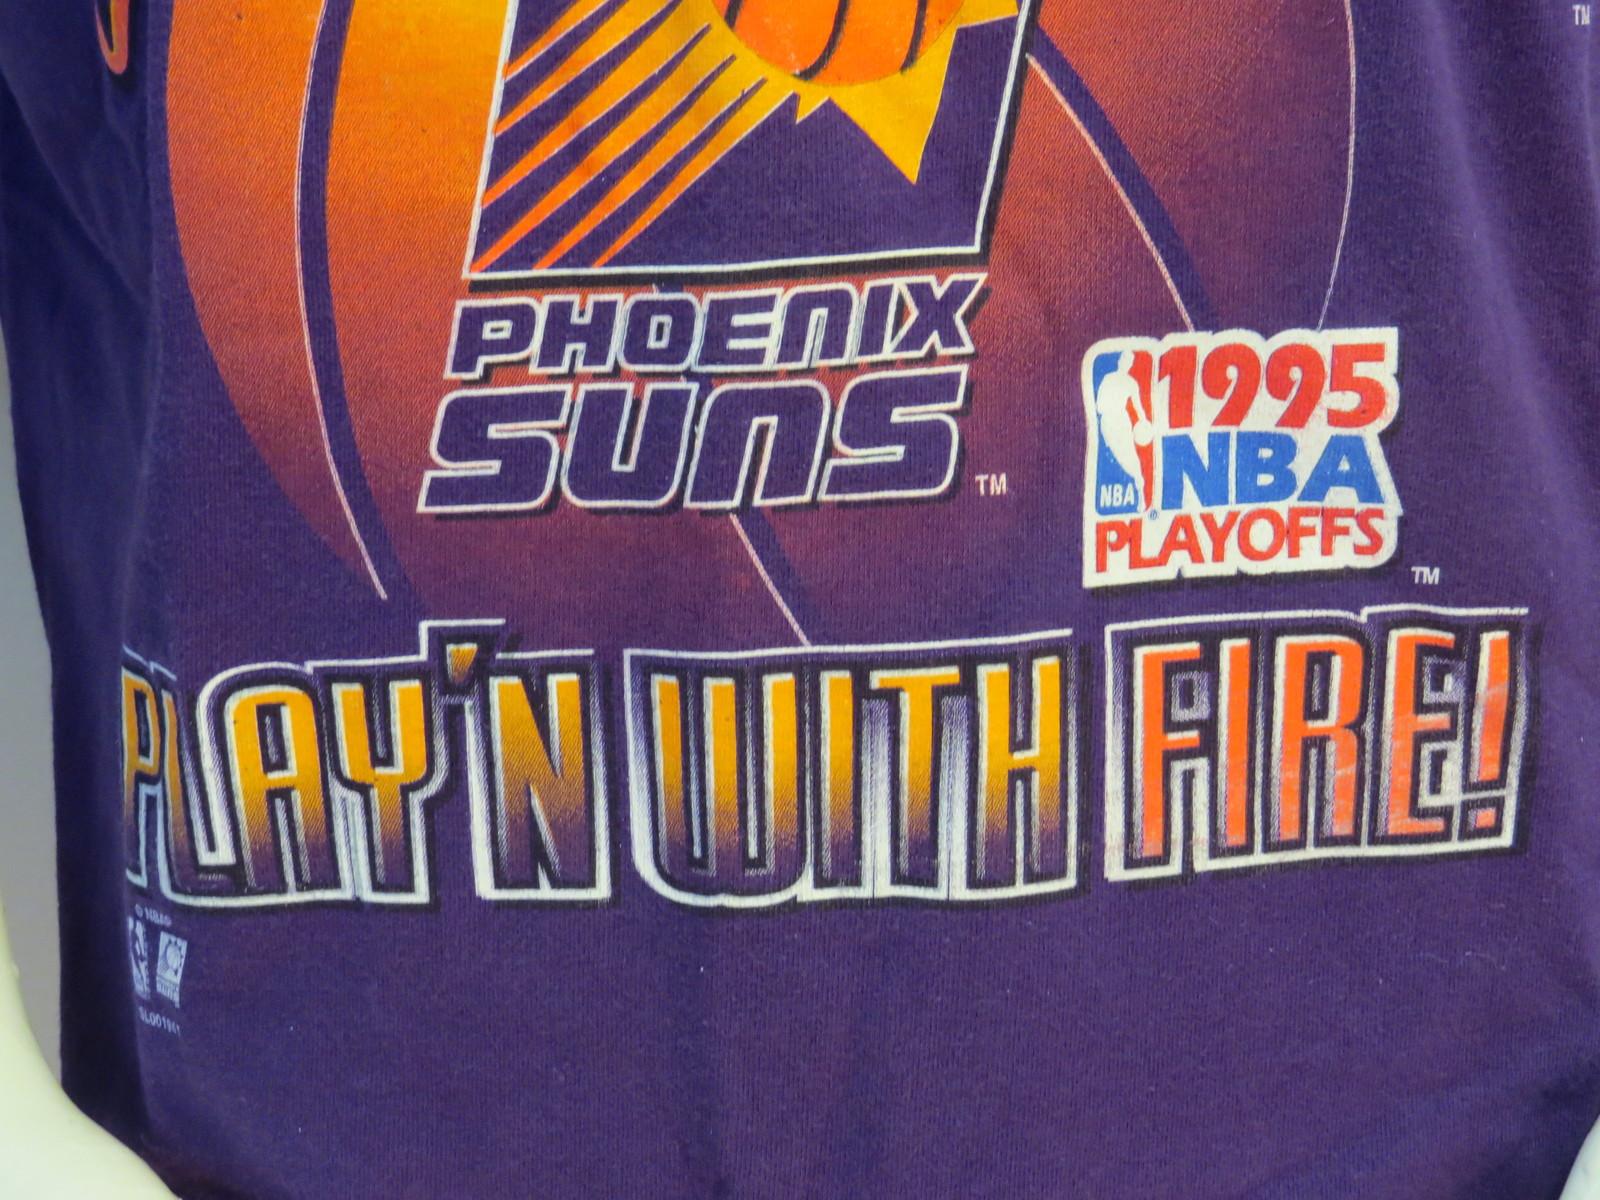 Phoenix Suns Shirt (VTG) -1995 Playoffs Playin with Fire Salem Sports-Mens Large